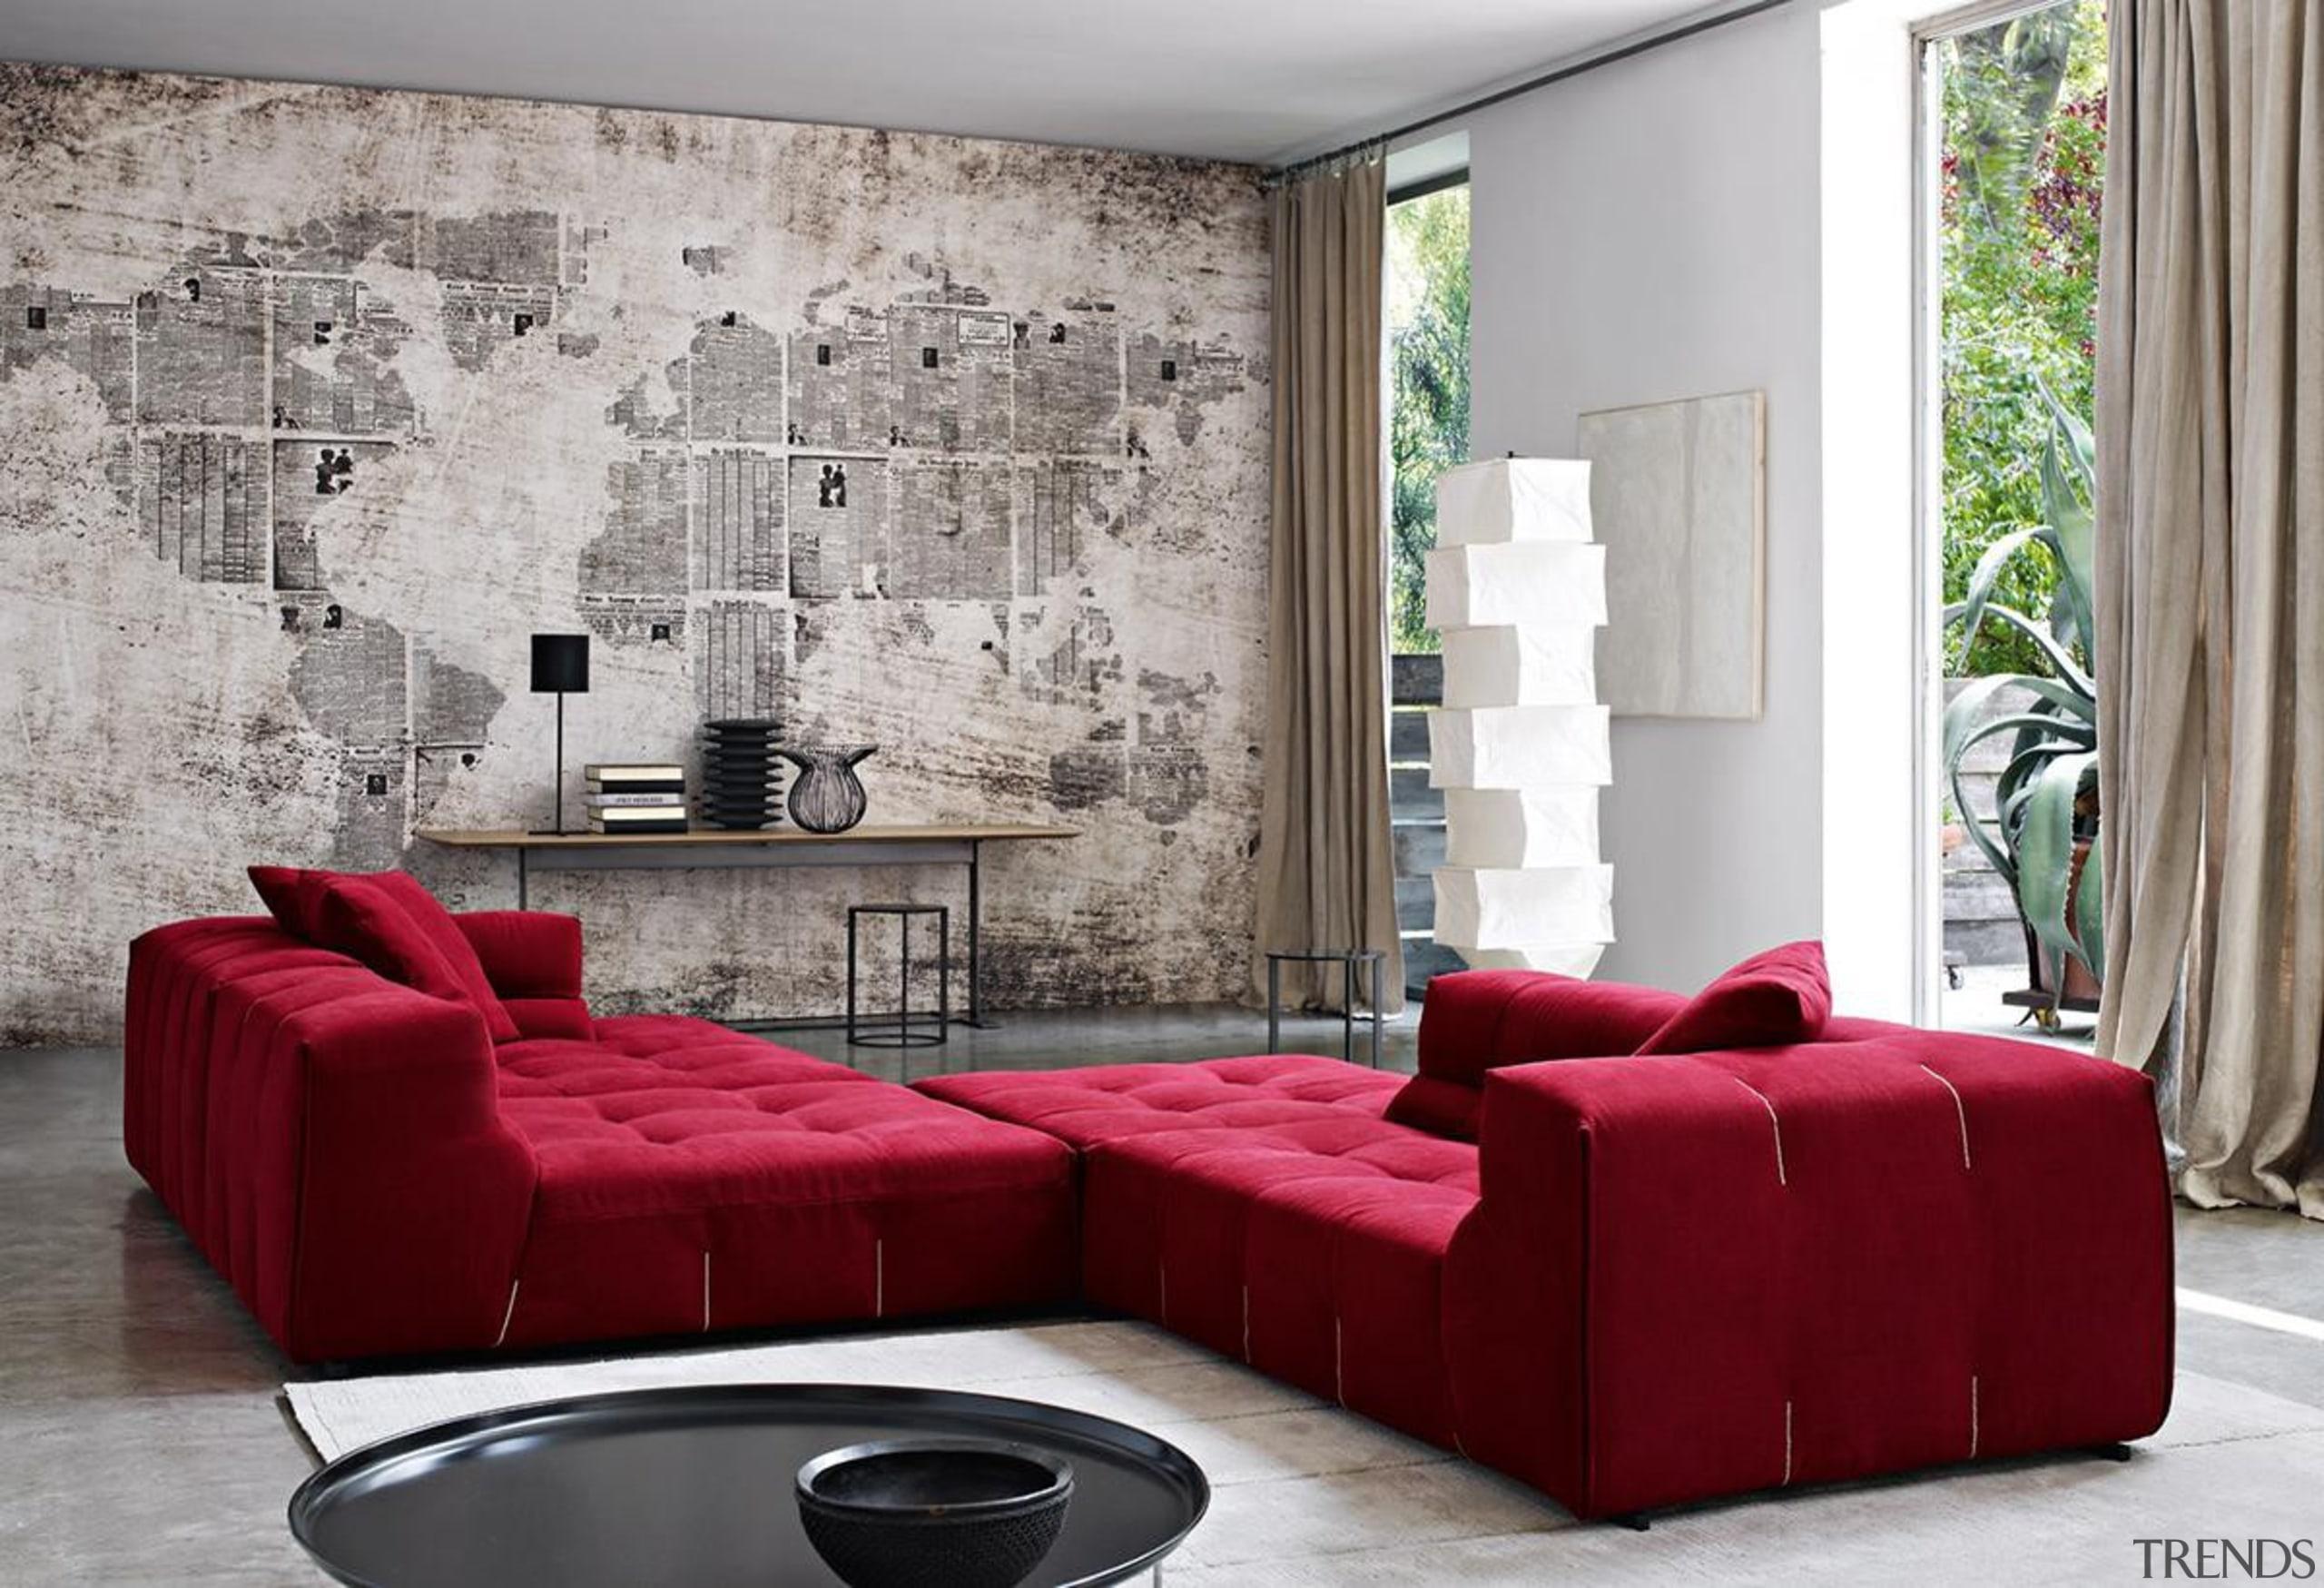 bebitaliaurquiolatuftytoosofaredinstu1200.jpg - bebitaliaurquiolatuftytoosofaredinstu1200.jpg - angle | chaise longue angle, chaise longue, couch, furniture, interior design, living room, loveseat, room, sofa bed, table, wall, gray